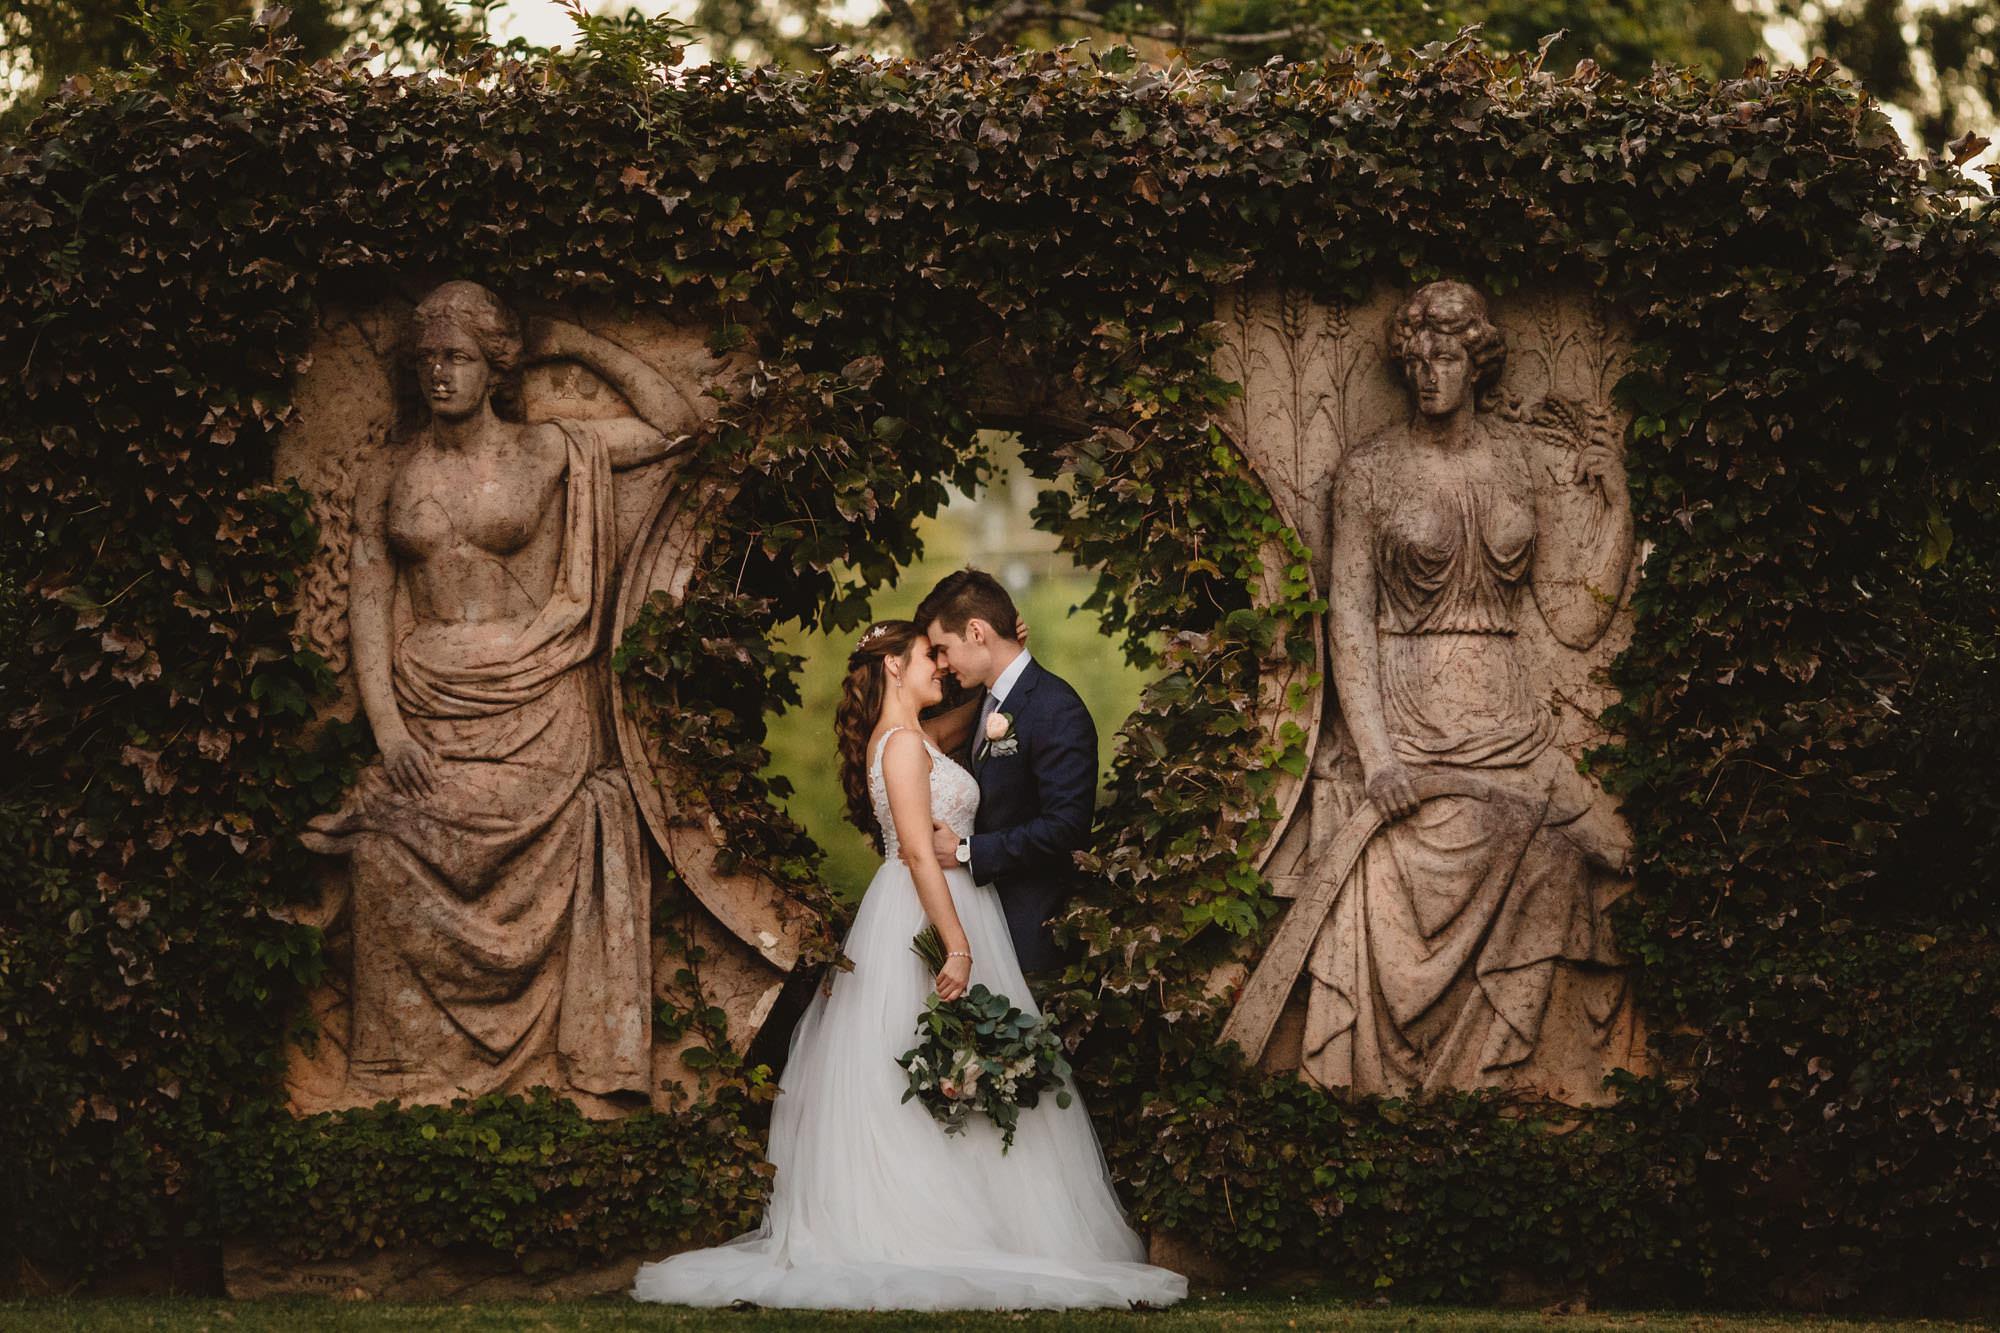 The Muse Albion Farm Gardens Wedding